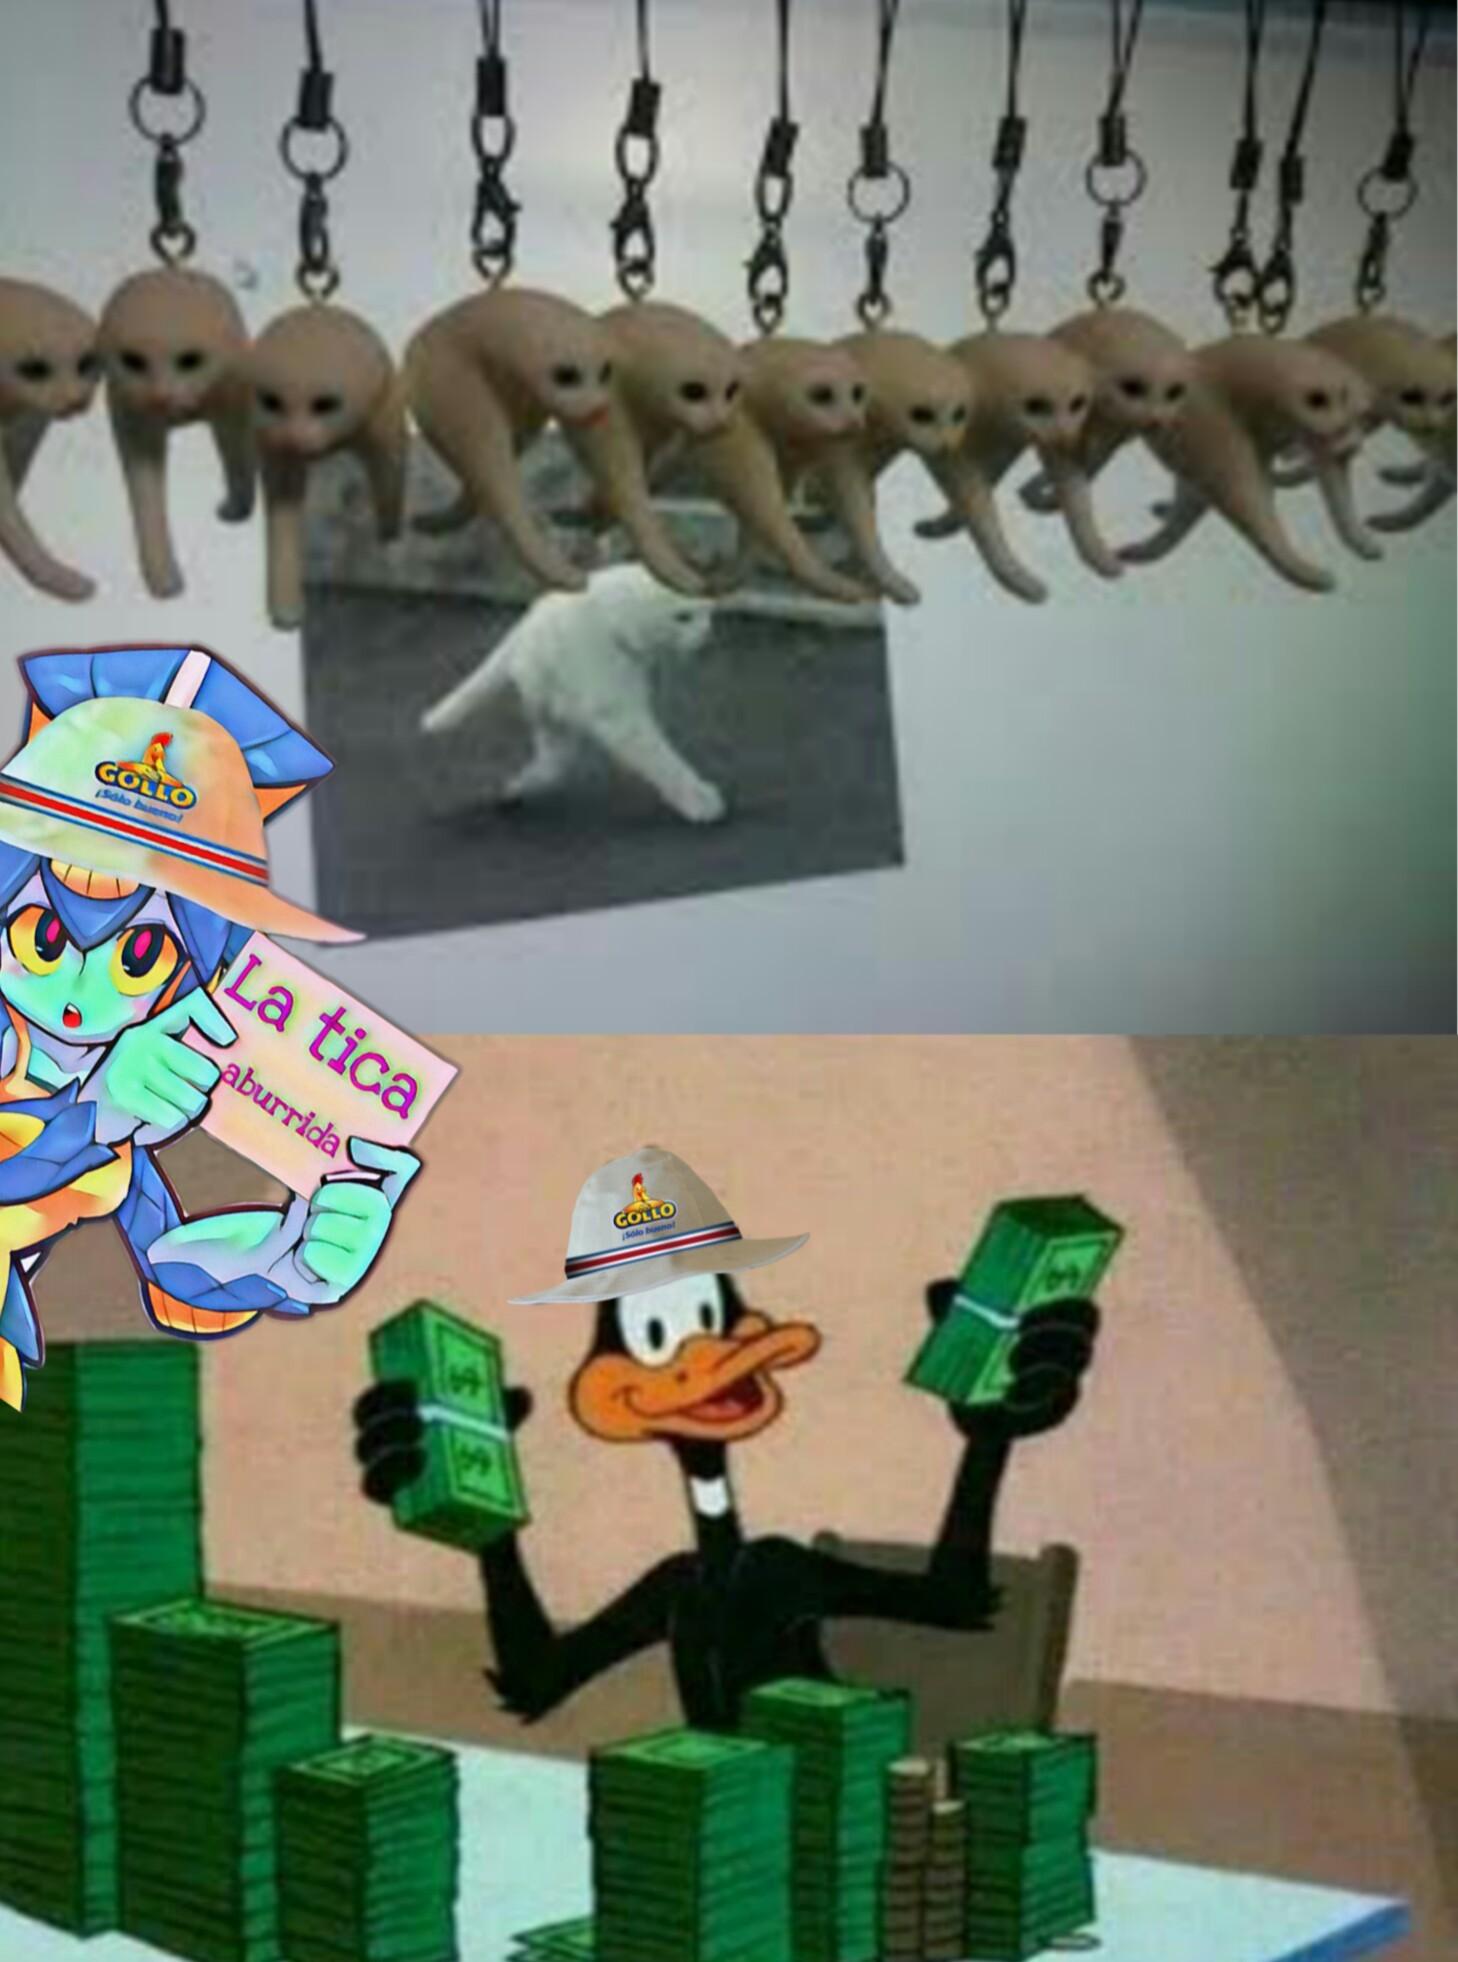 Sinko lones - meme